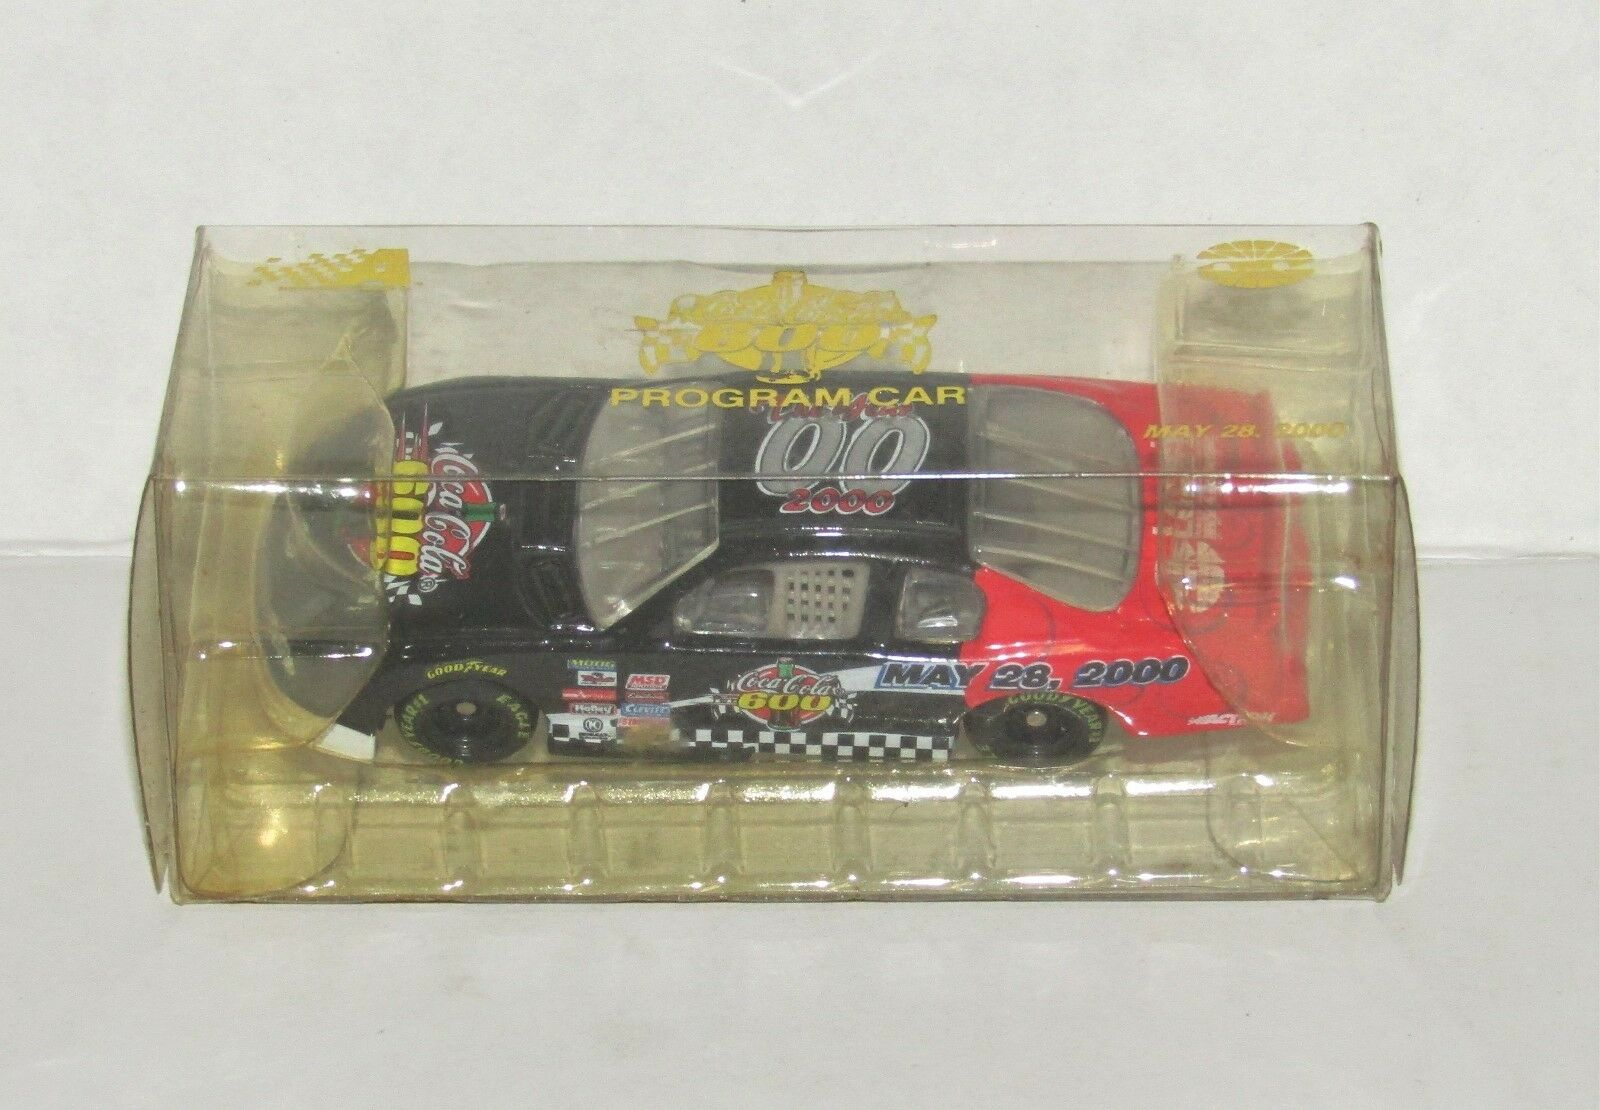 NASCAR Action 2000 Charlotte Coca-Cola 600 Program Car 1 64 Diecast Car